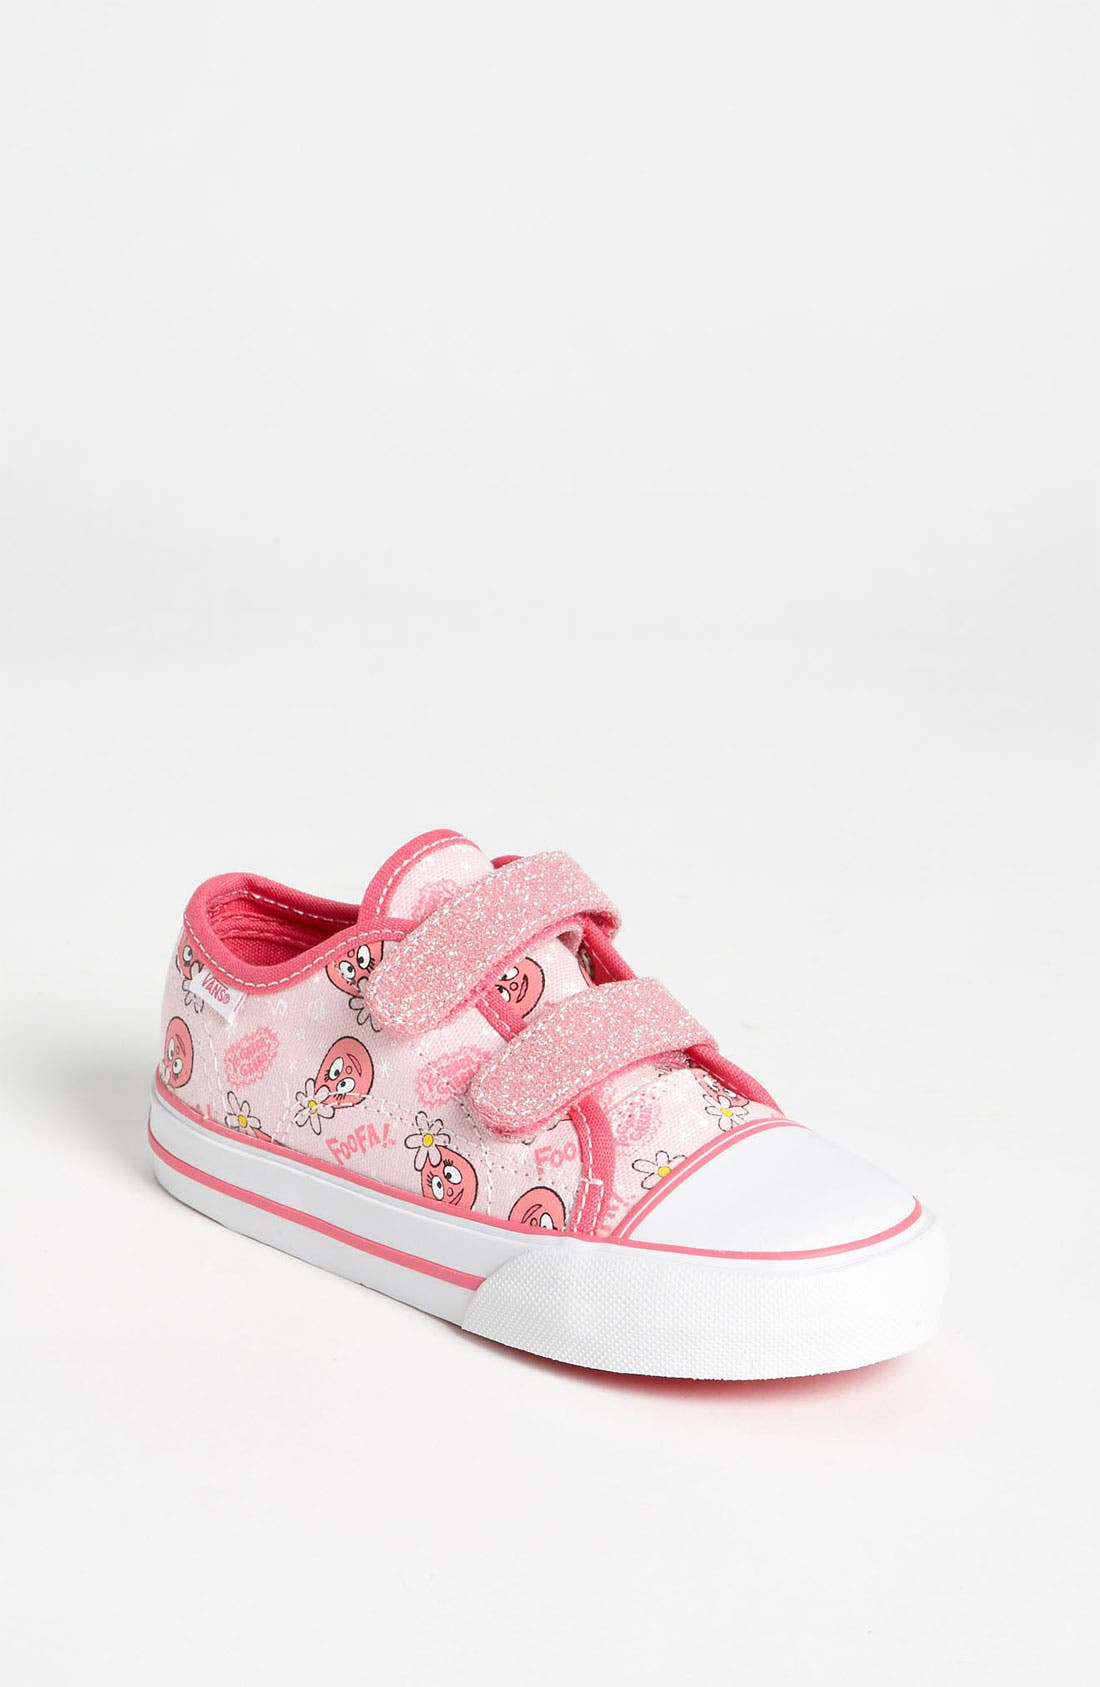 Alternate Image 1 Selected - Vans 'Big School - Yo Gabba Gabba!' Sneaker (Baby, Walker & Toddler)